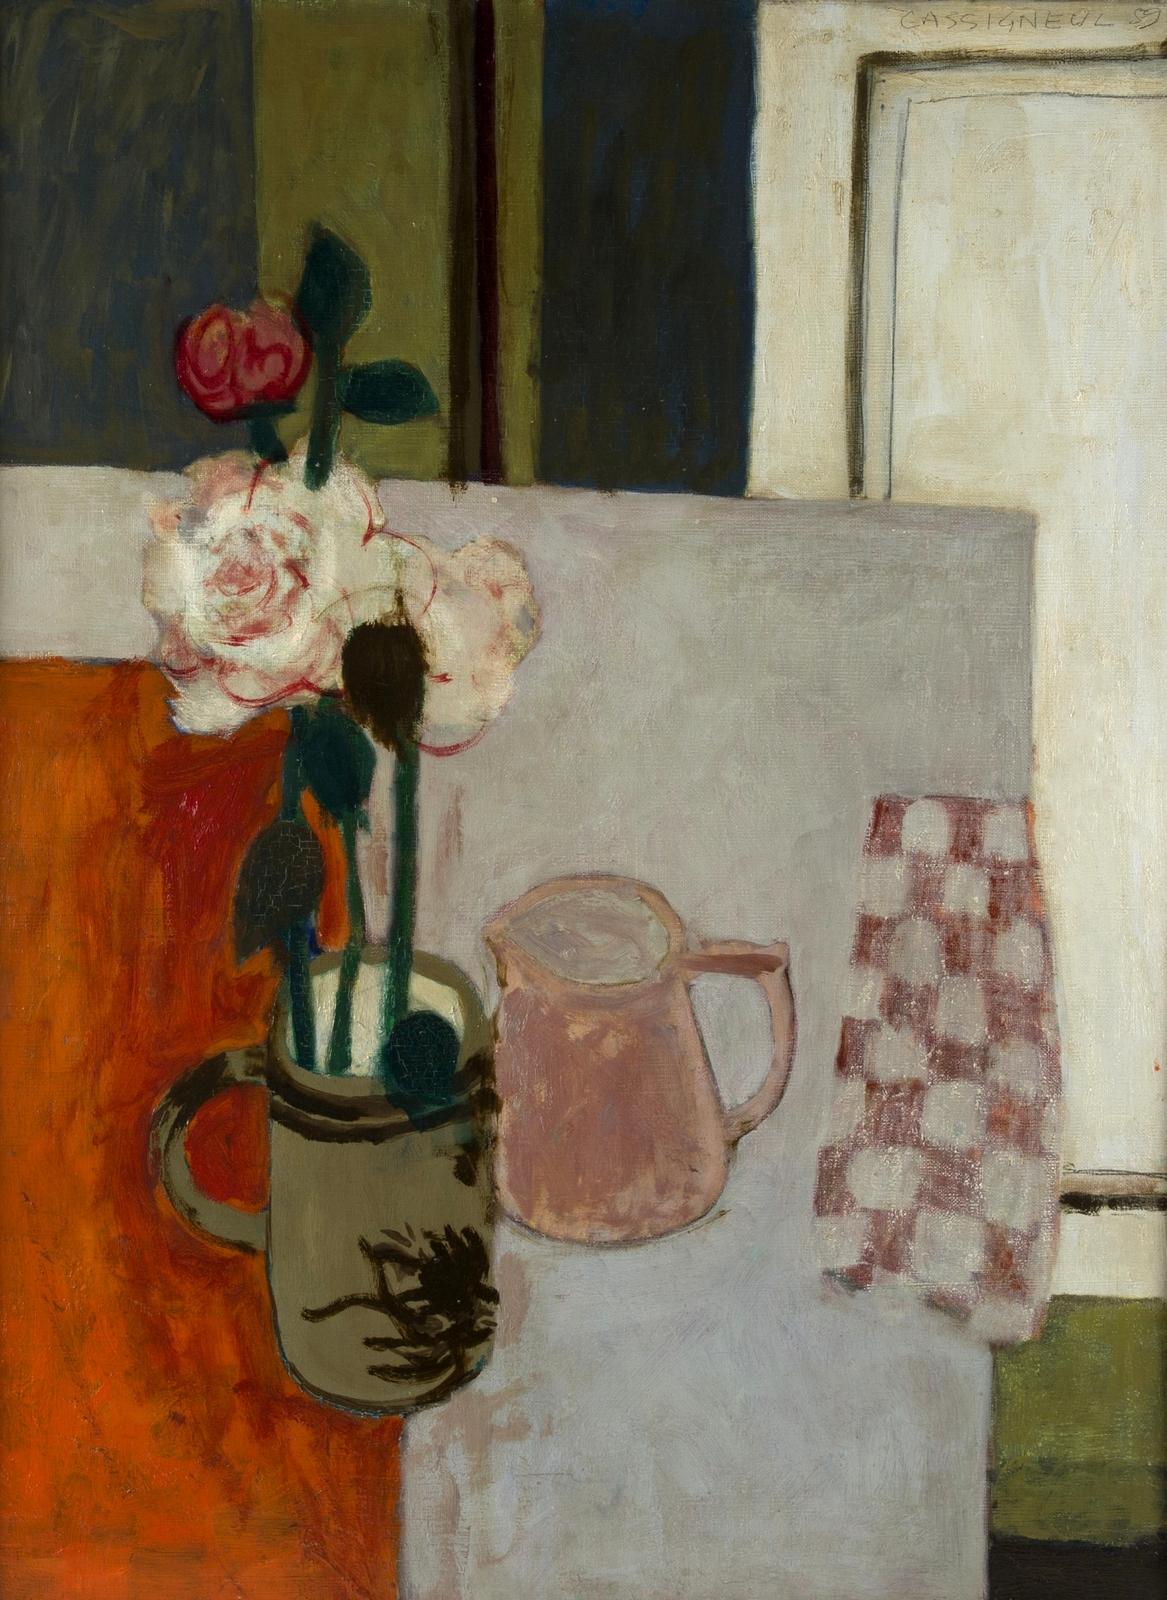 1959_Натюрморт с цветами и кувшином (Still Life with Flowers and a Jug)_72.5 x 54_х.,м._Частное собрание.jpg